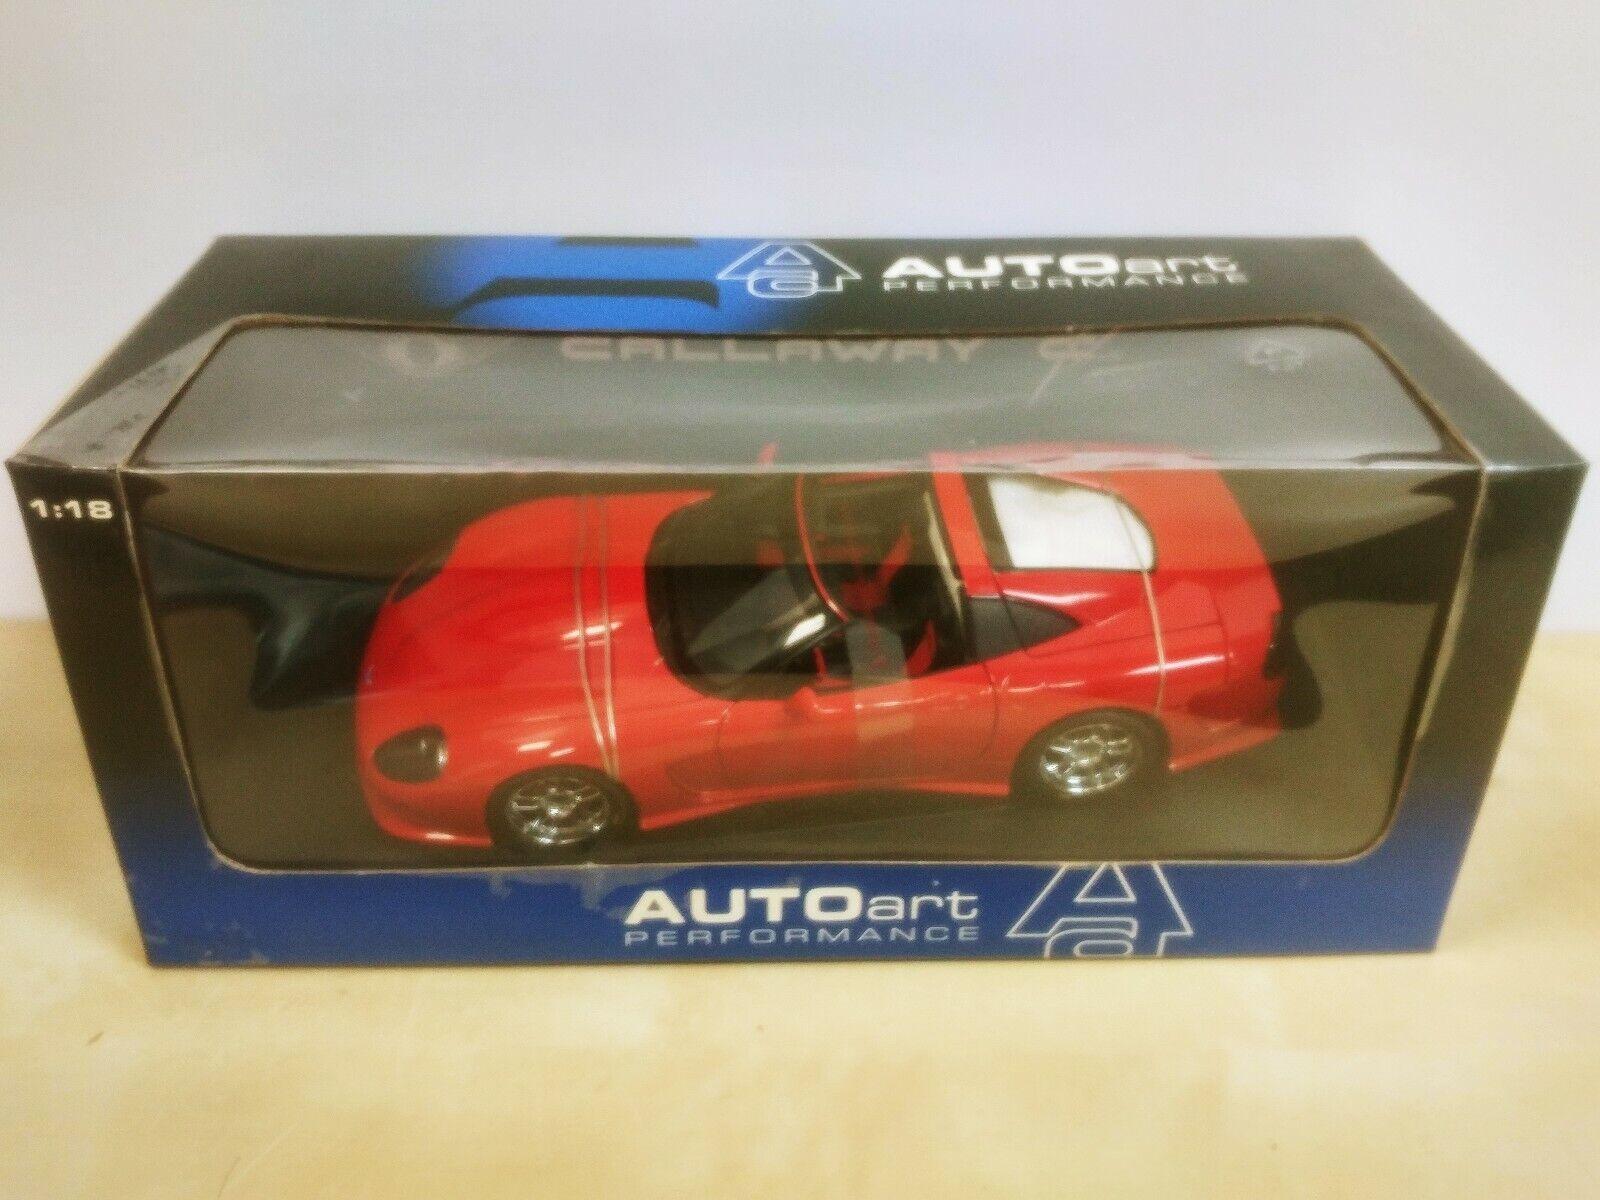 AUTOart Callaway C12 rosso 1 18 Brand New